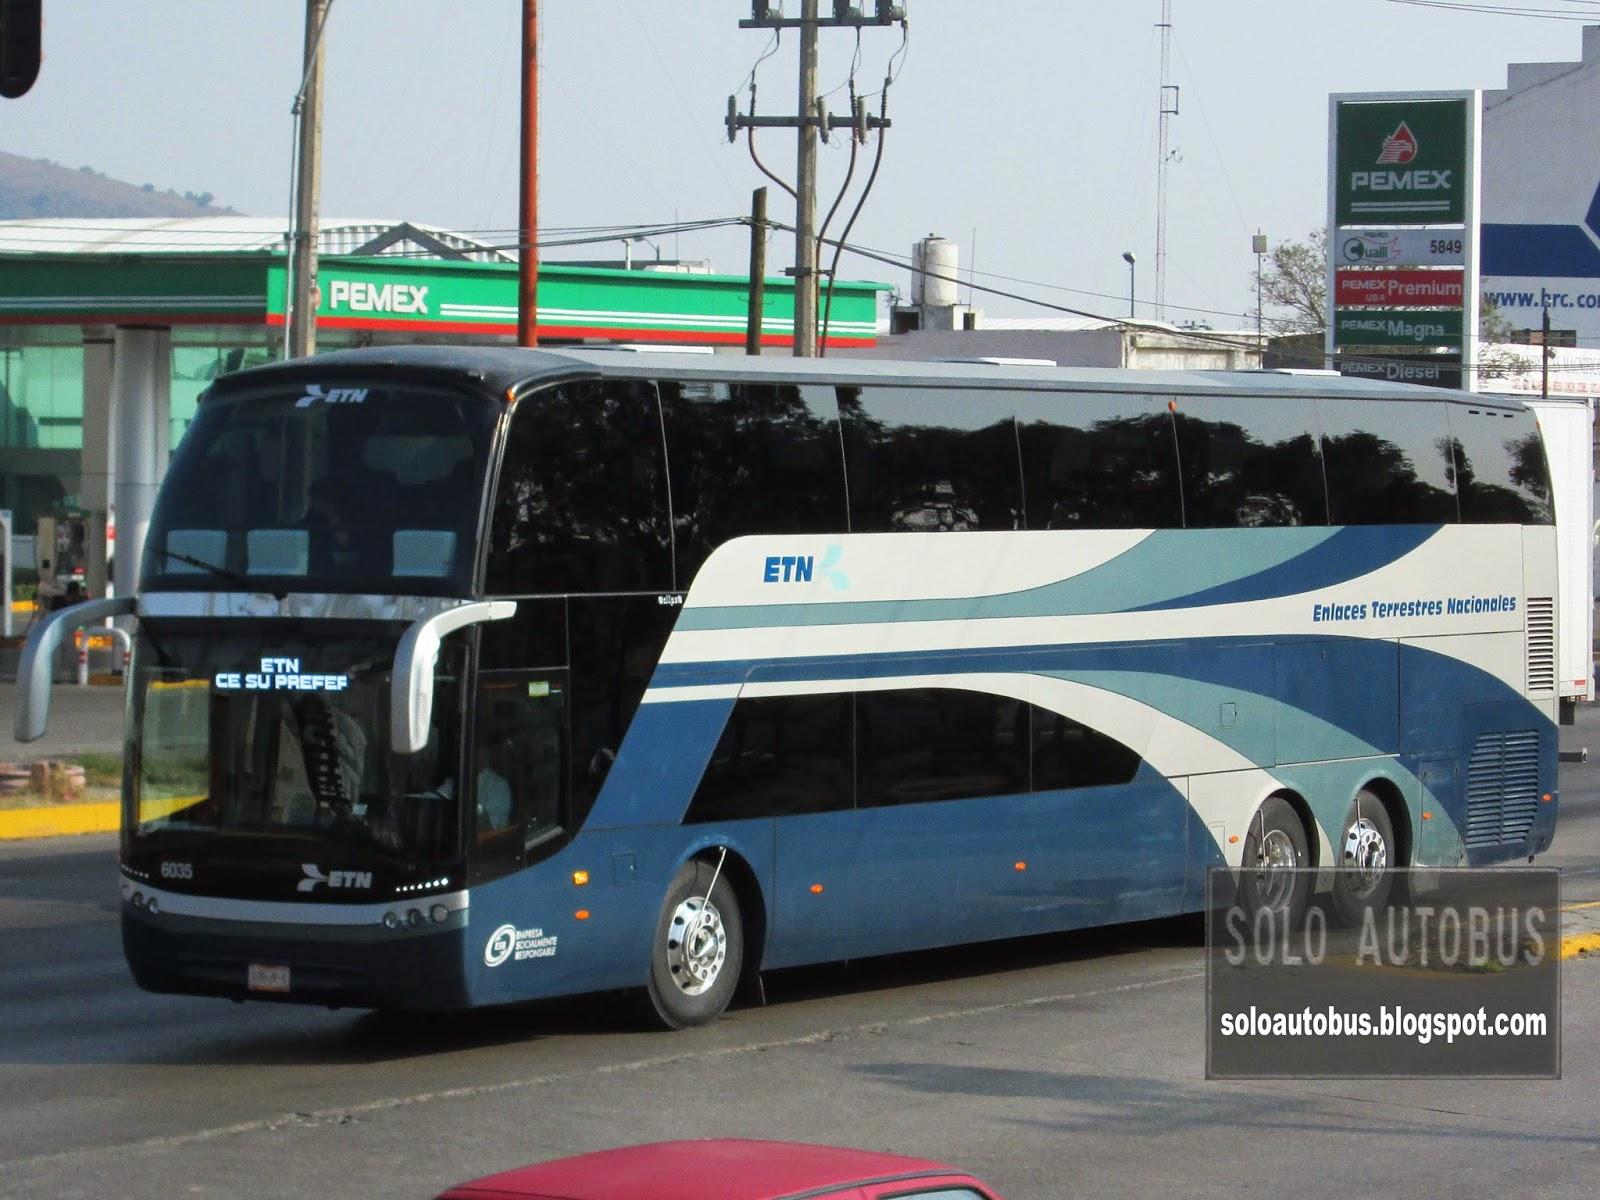 Soloautobus ayats eclipse etn - Autobuses de dos pisos ...